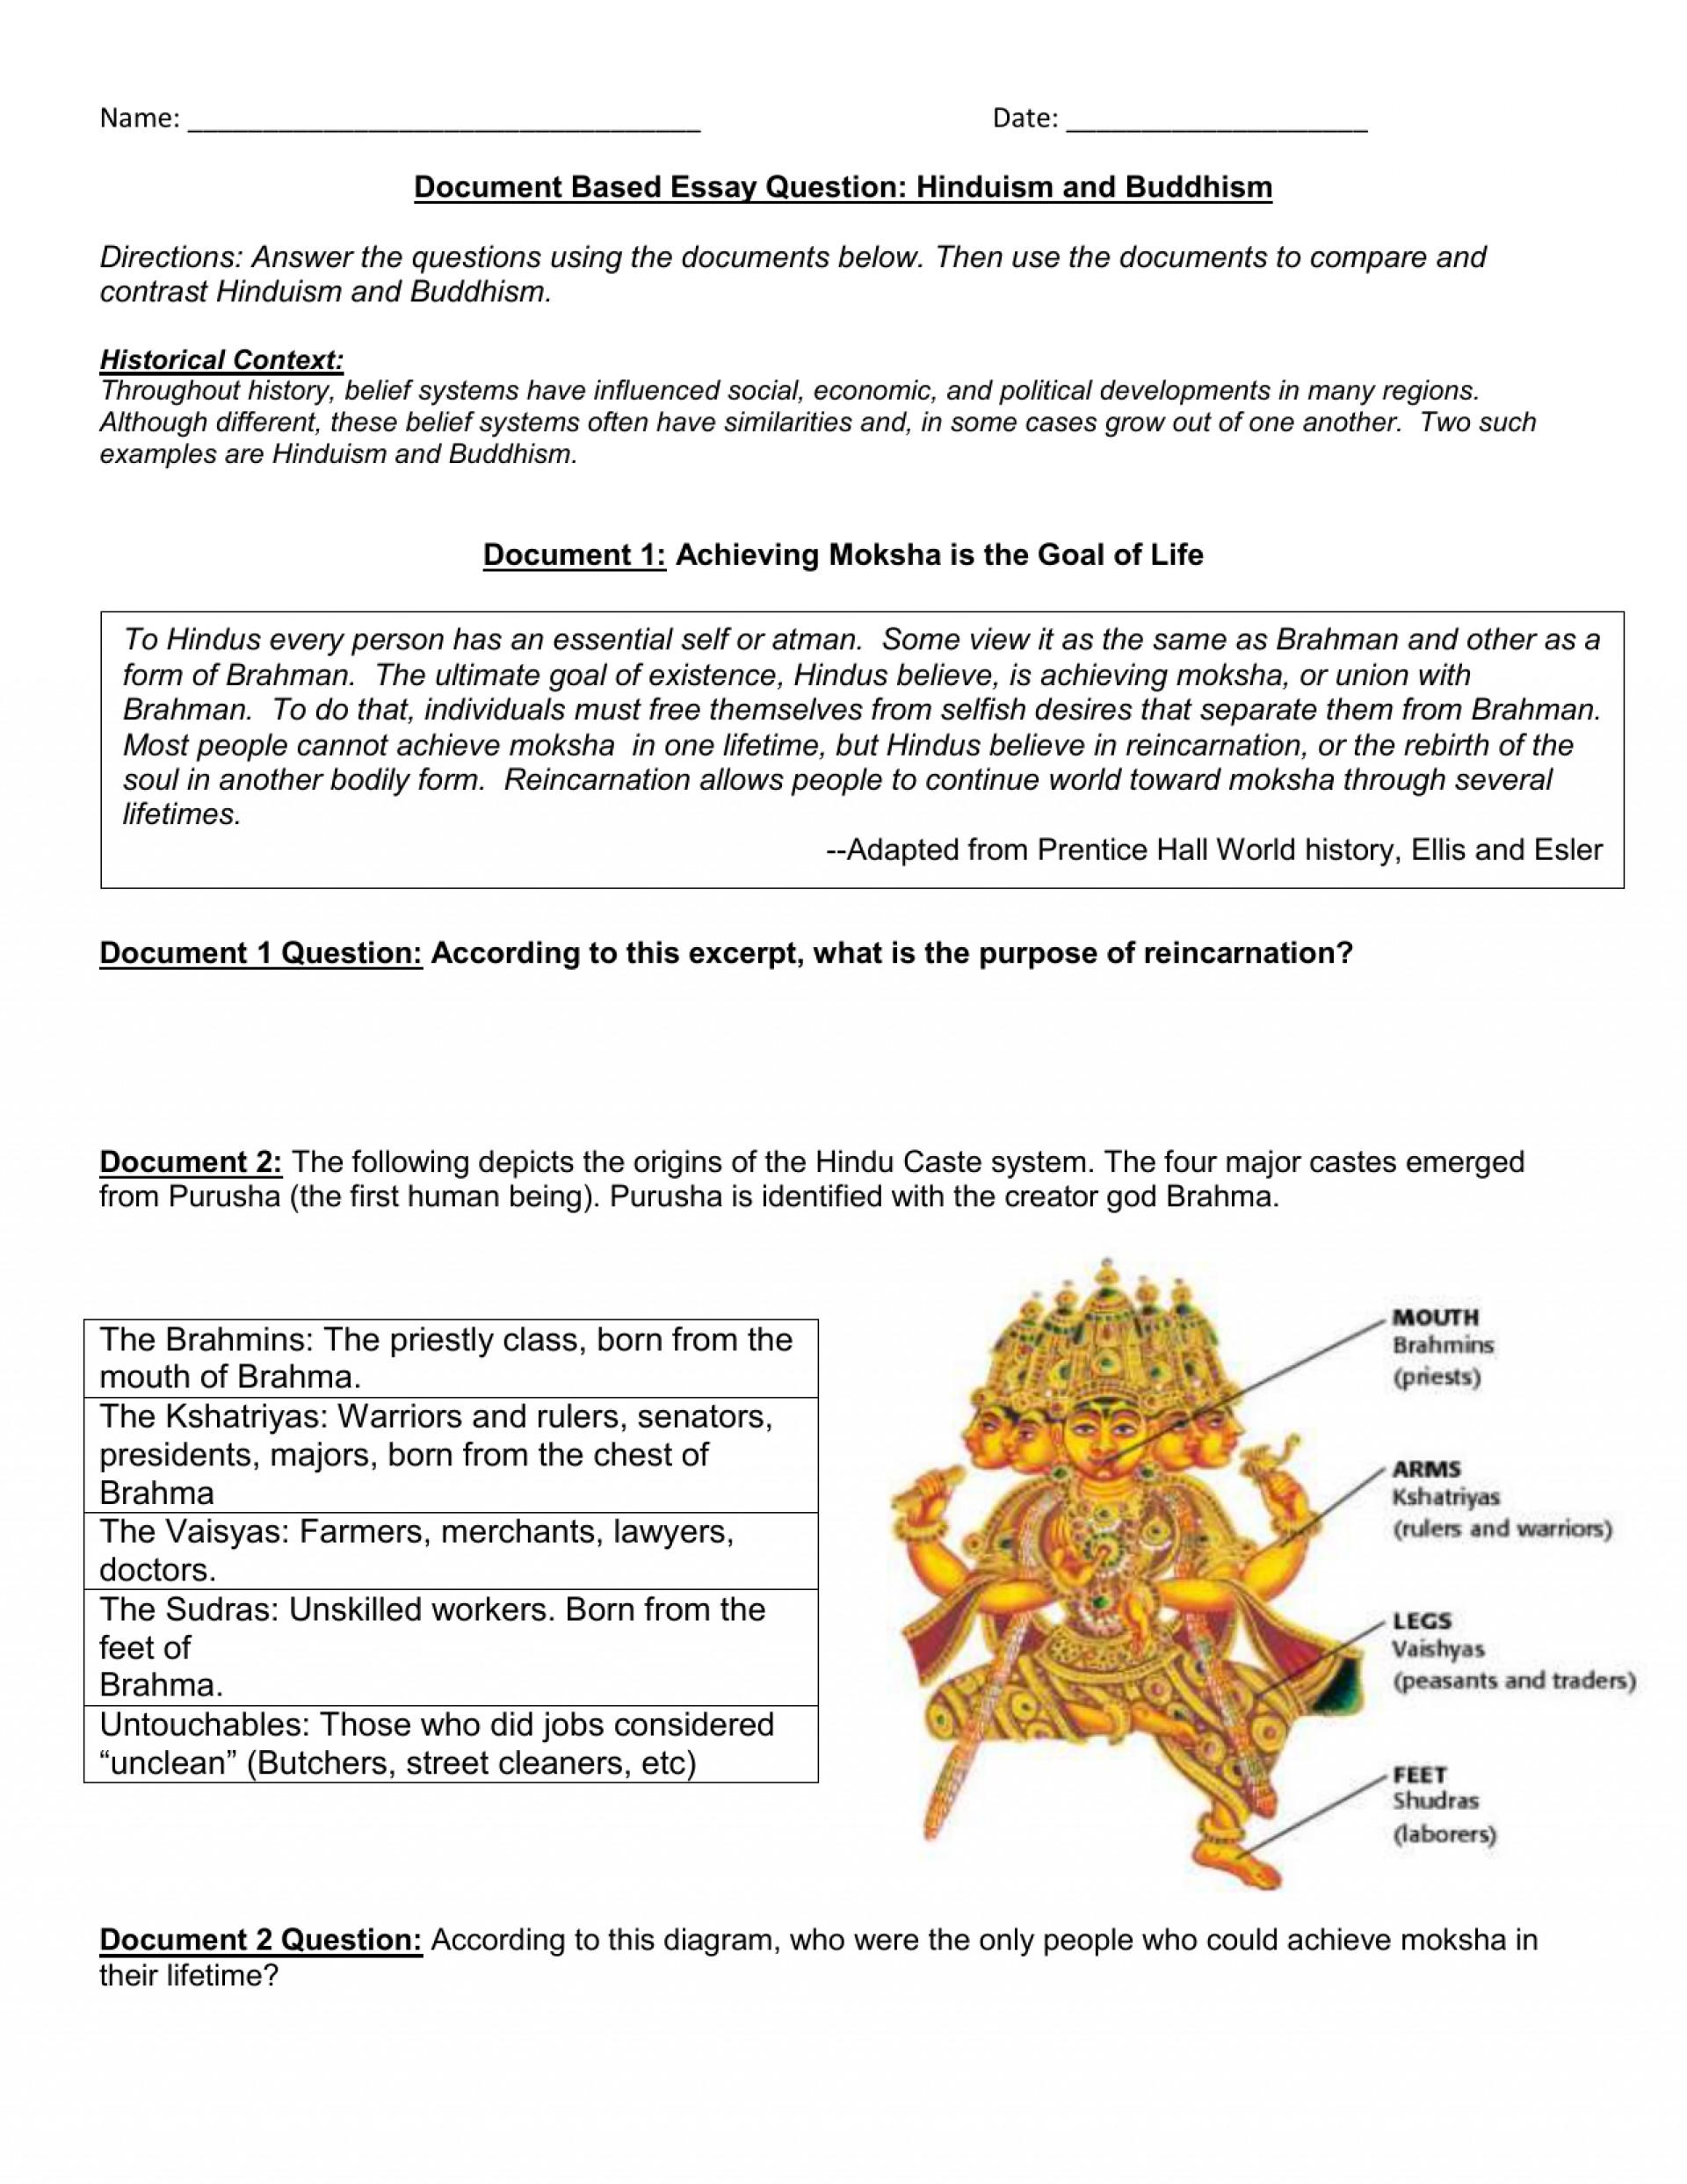 006 009328677 1 Essay Example Surprising Hinduism Questions Hindu Muslim Ekta In Hindi And Buddhism Introduction 1920